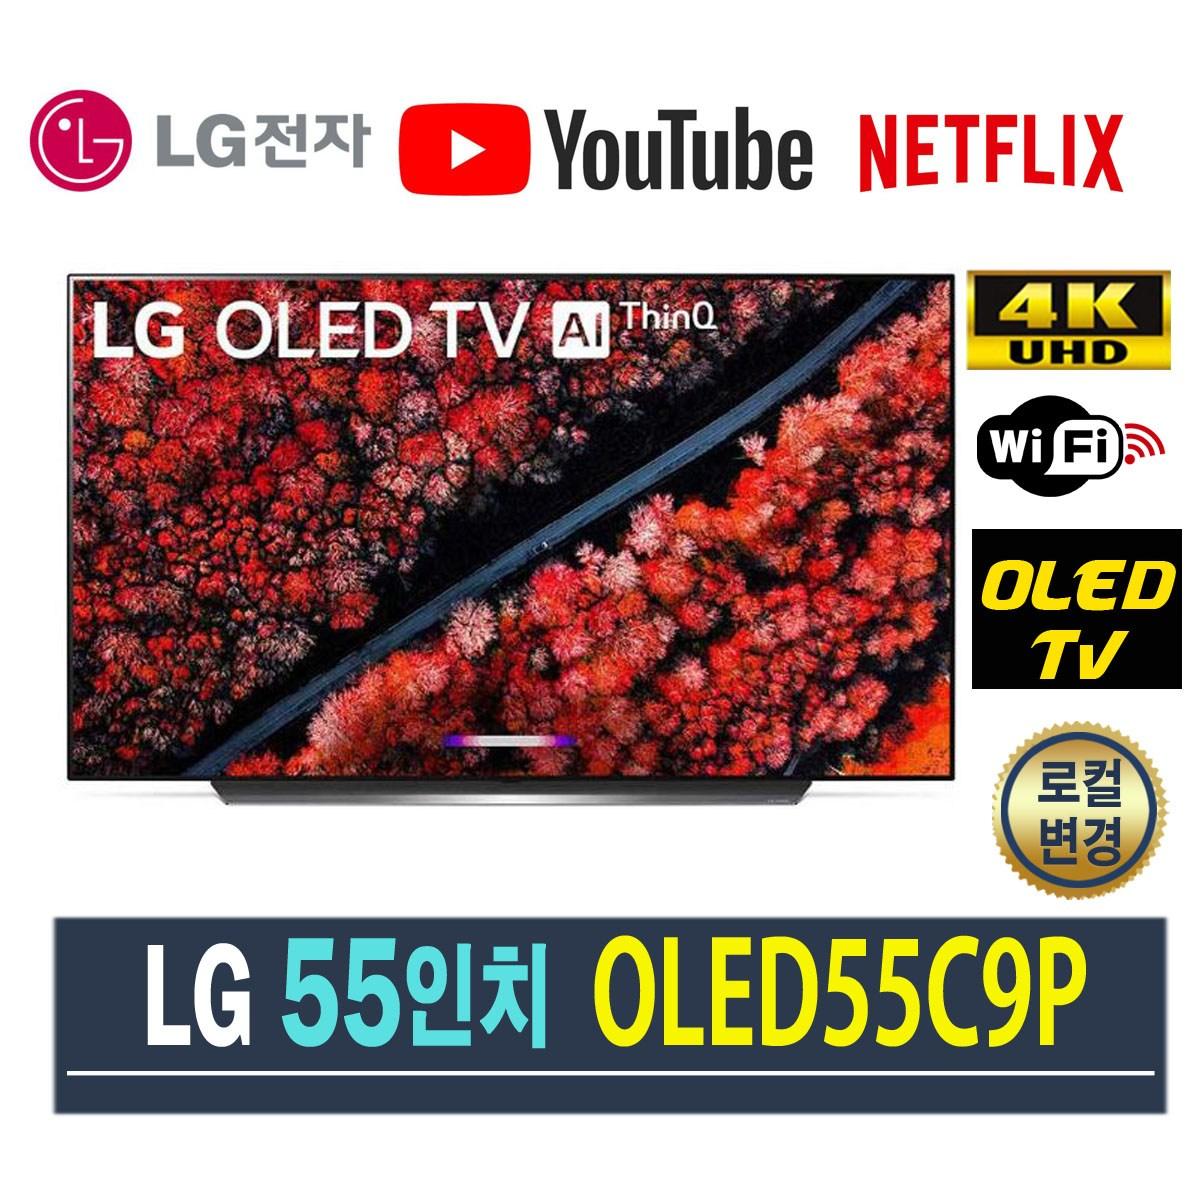 LG 올레드TV AI ThinQ 55인치 리퍼 OLED55C9P, 센터방문수령